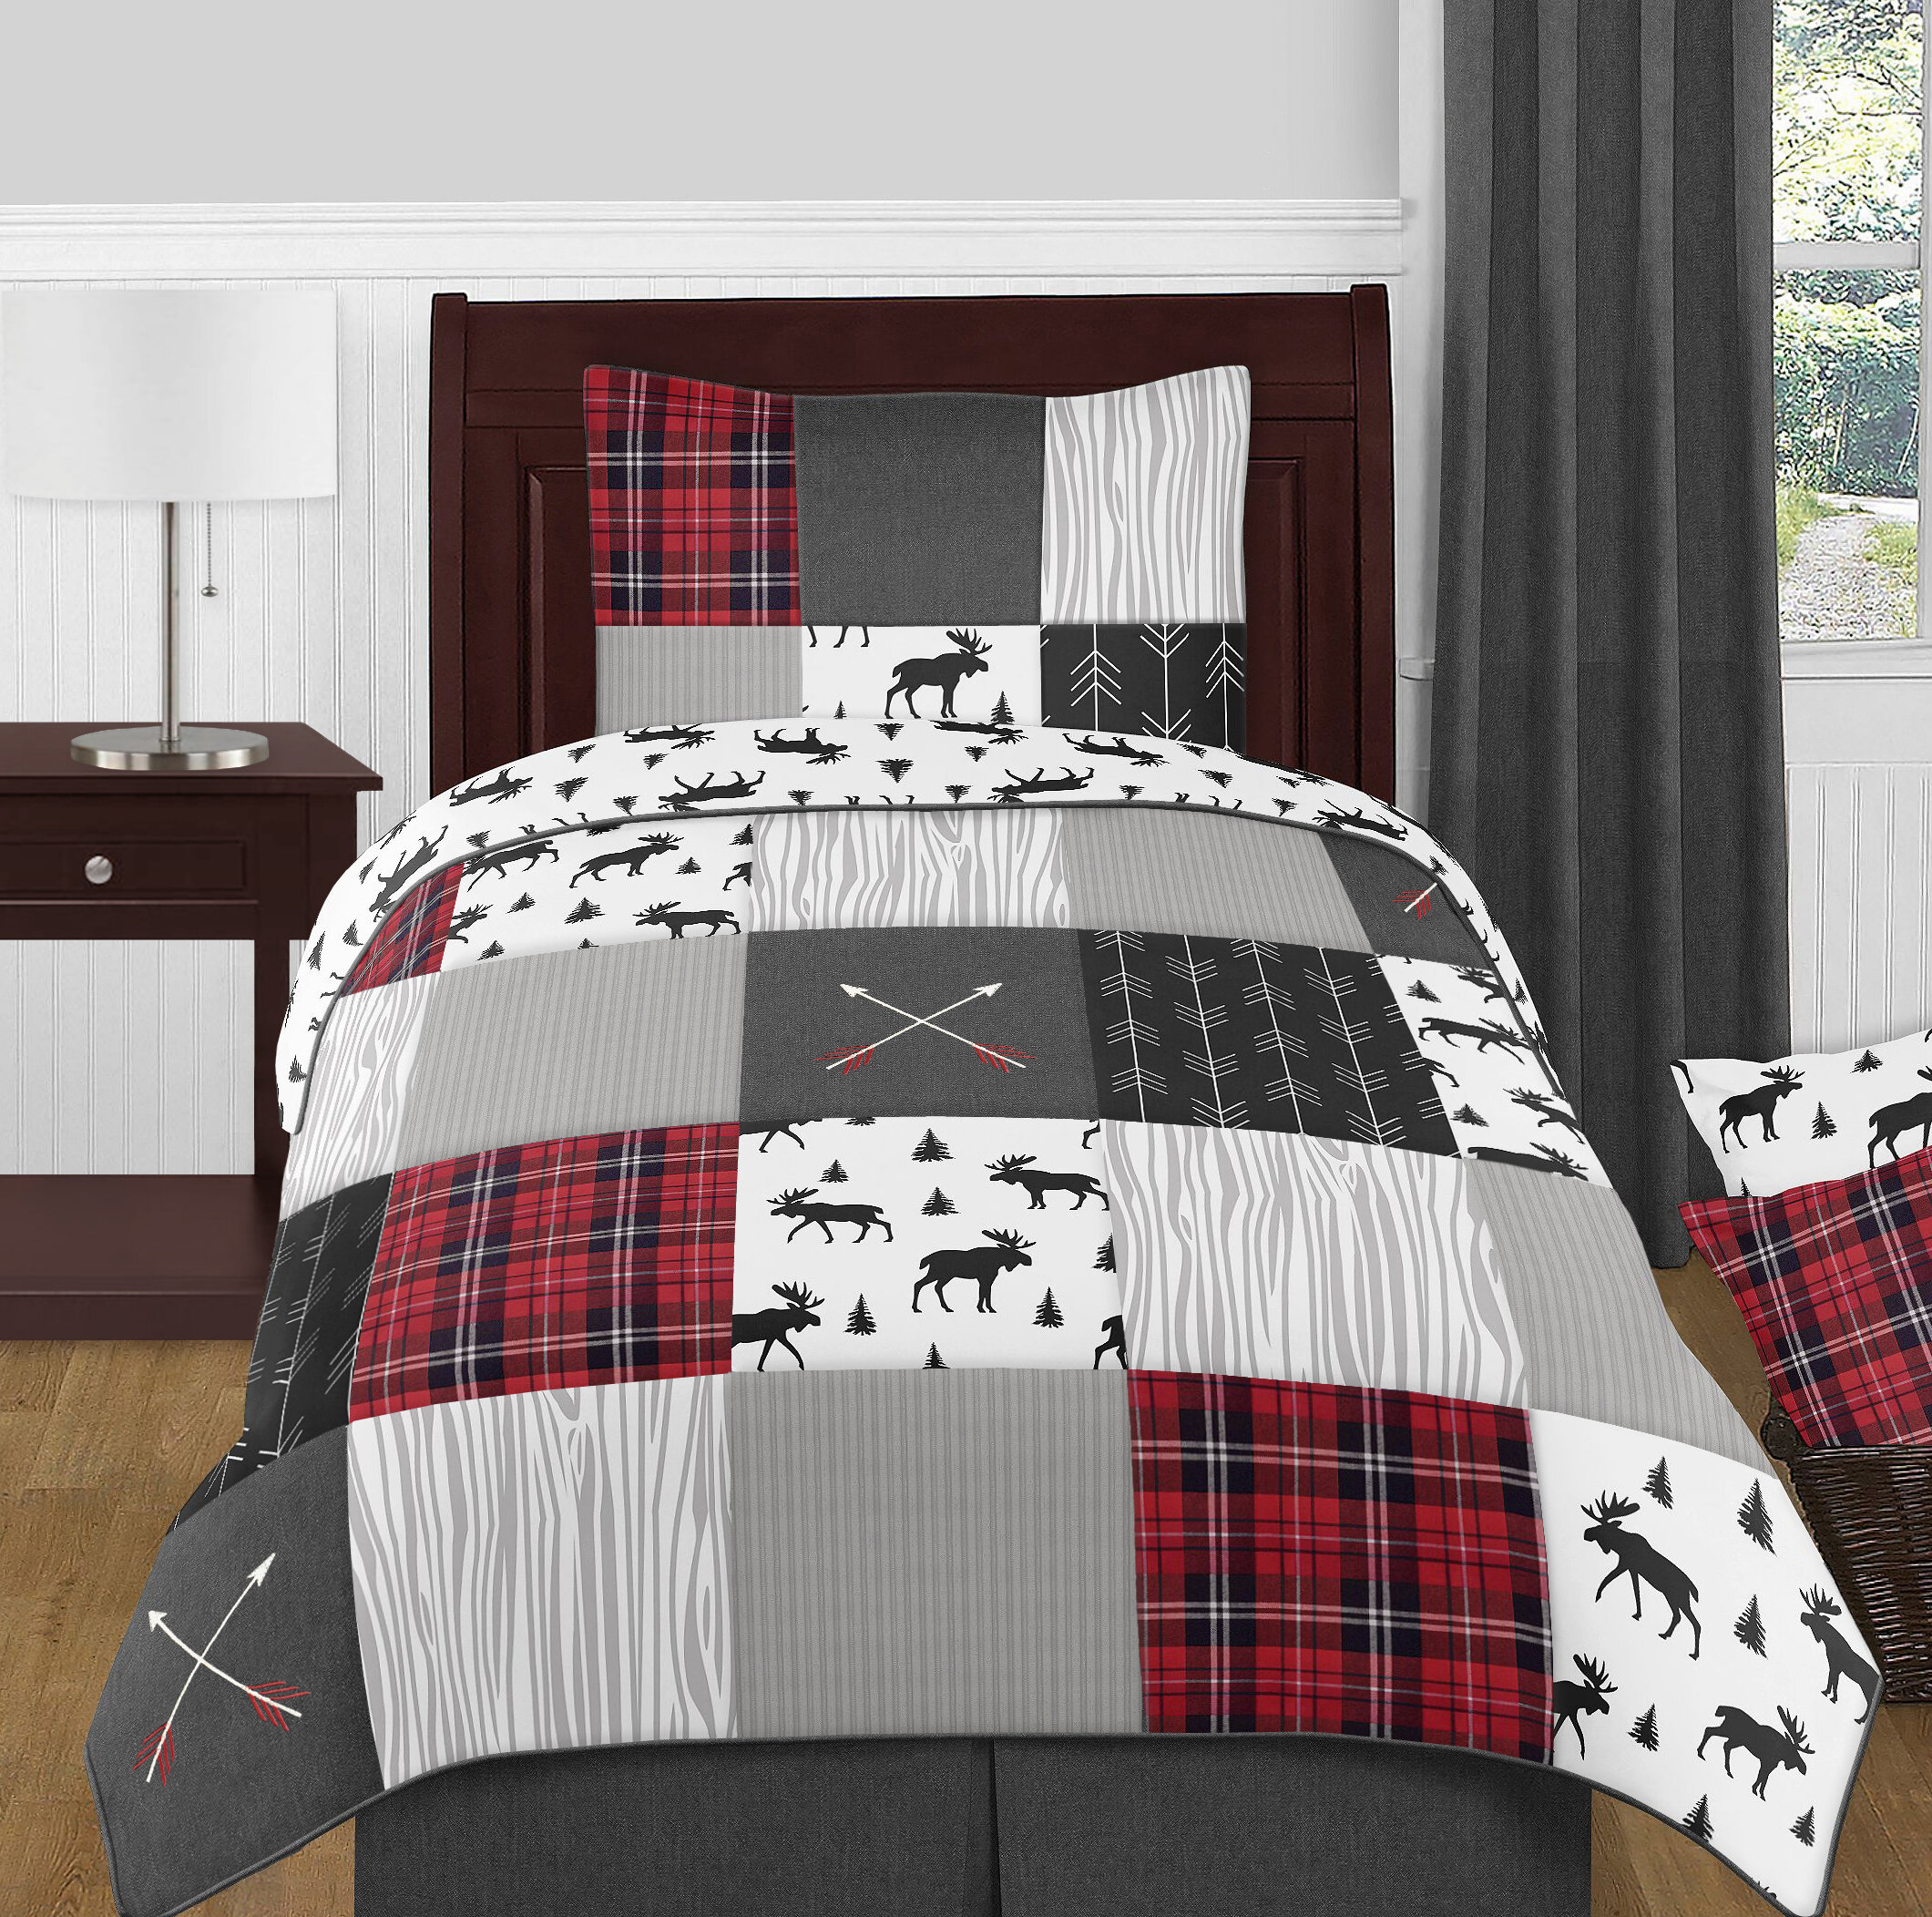 Sweet Jojo Designs Rustic Patch 4 Piece Twin Reversible Comforter Set Reviews Wayfair